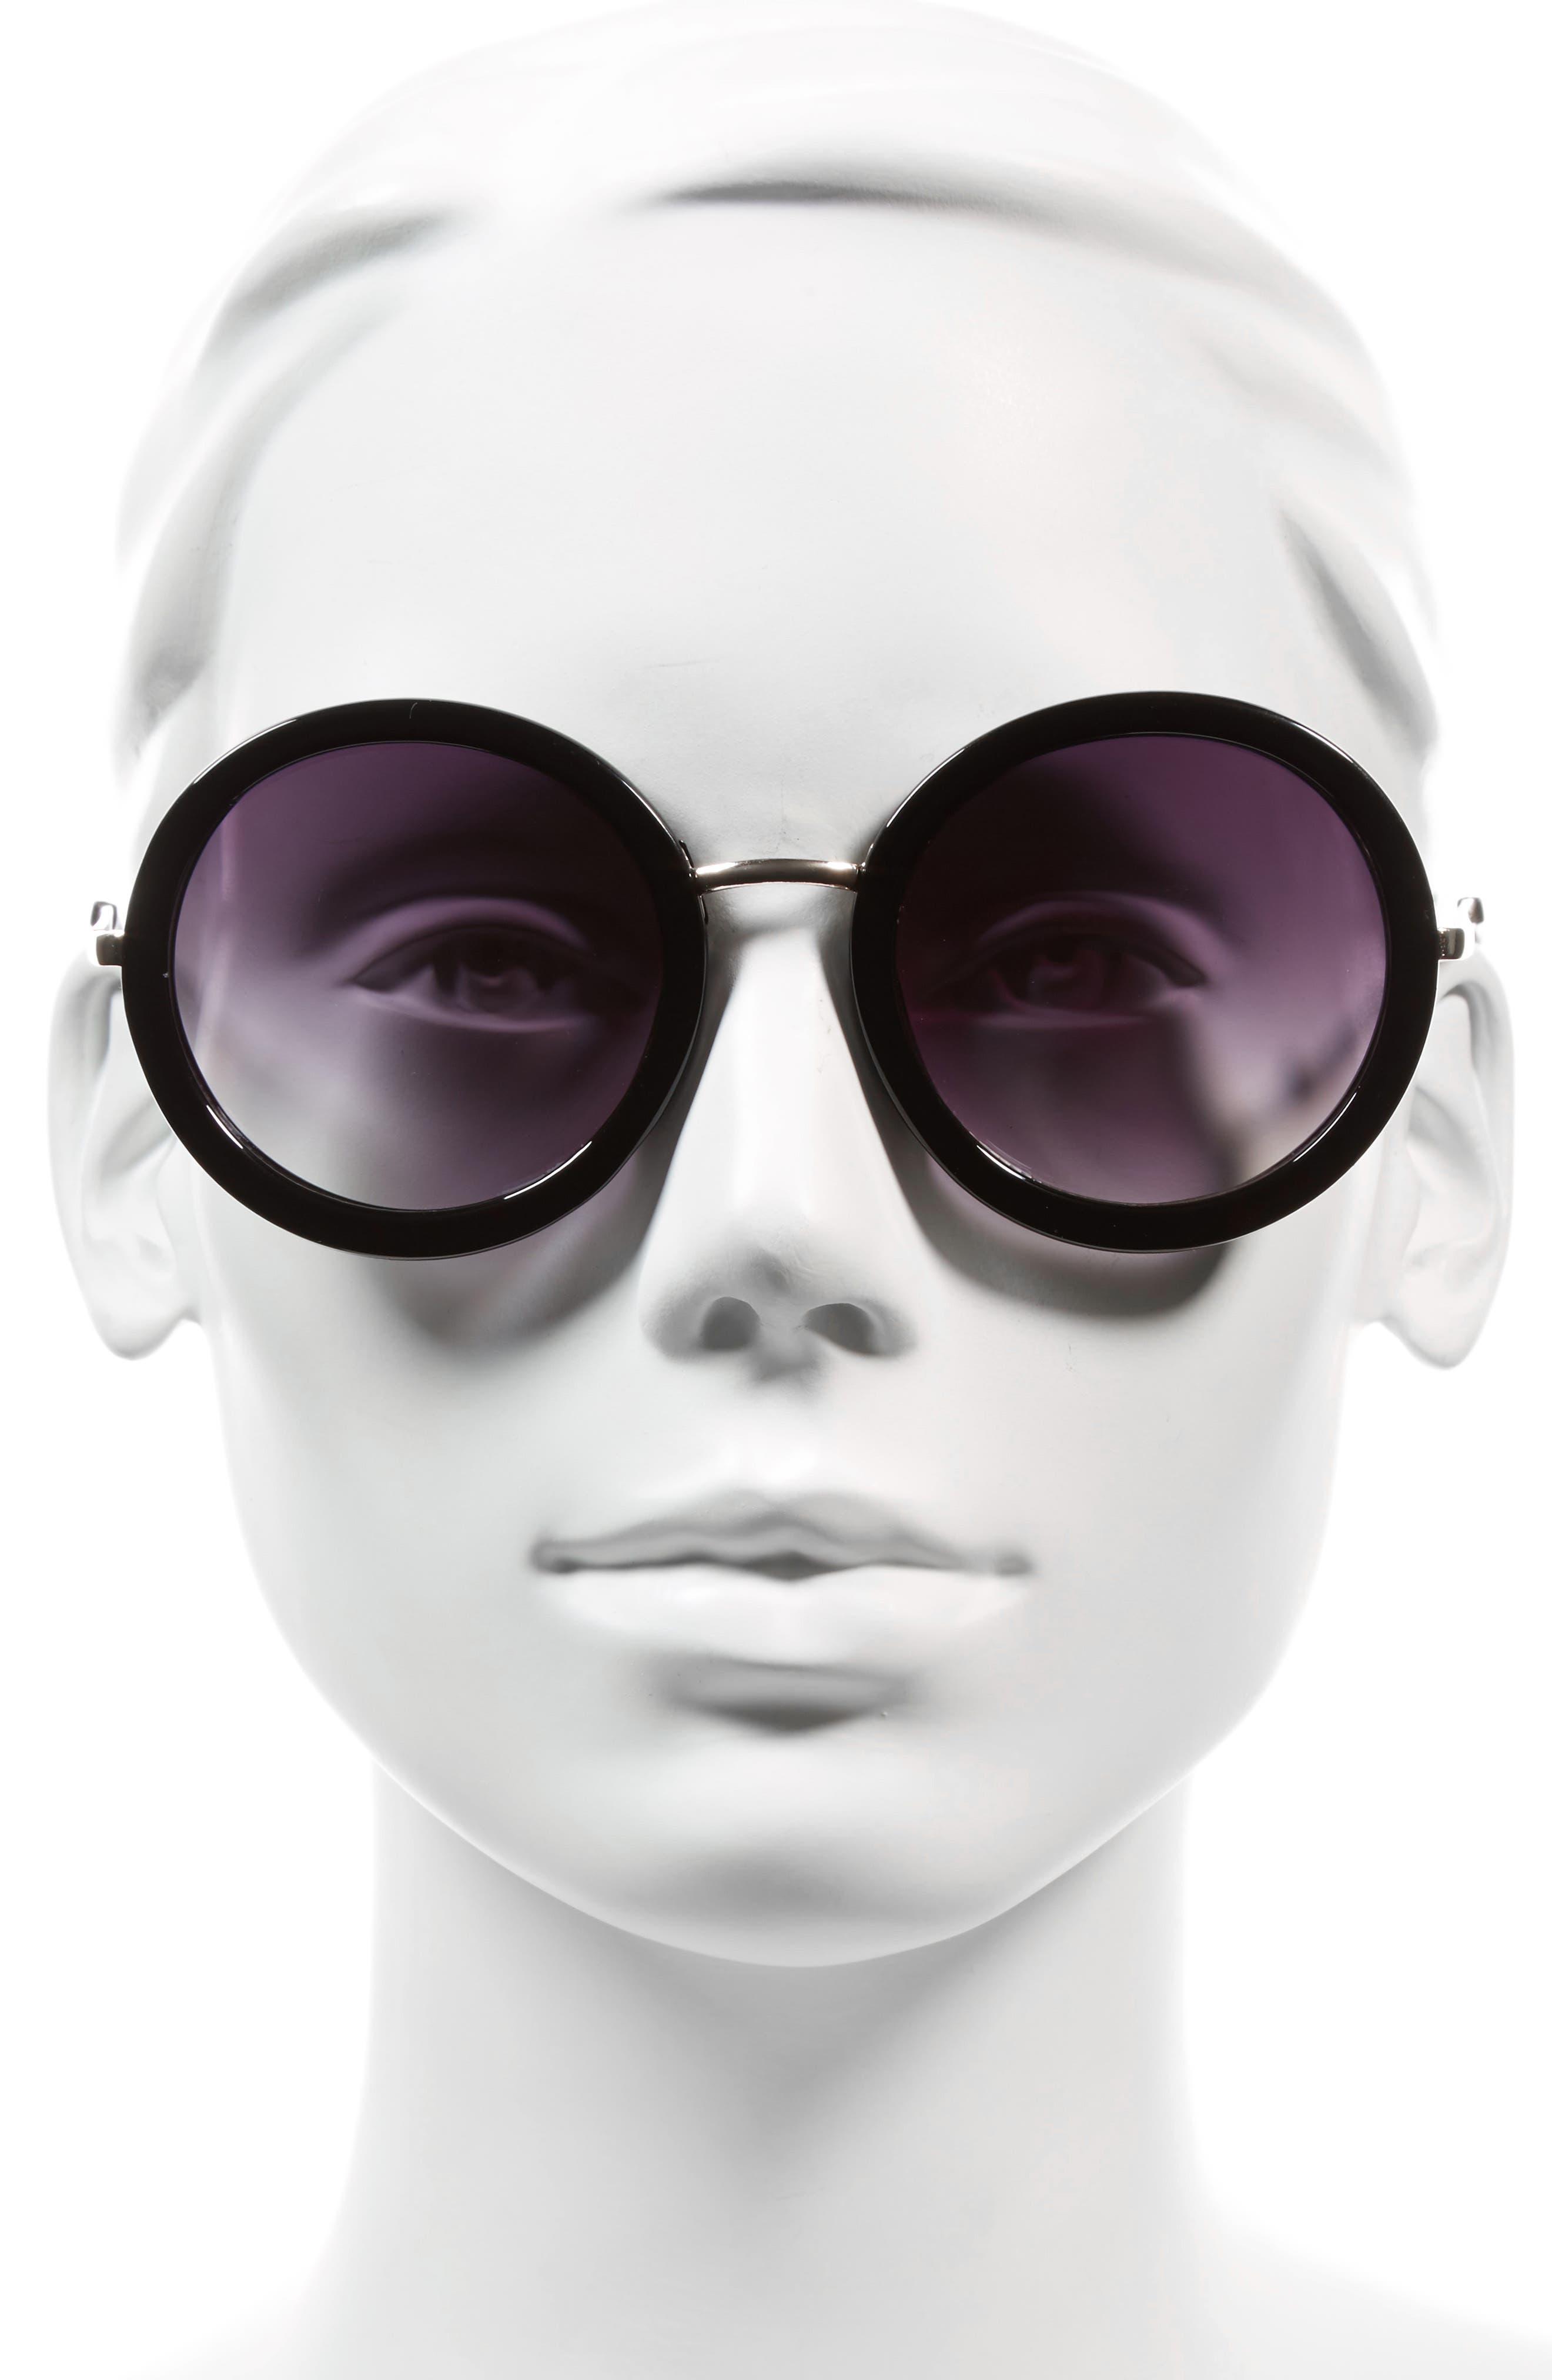 51mm Round Sunglasses,                             Alternate thumbnail 2, color,                             001